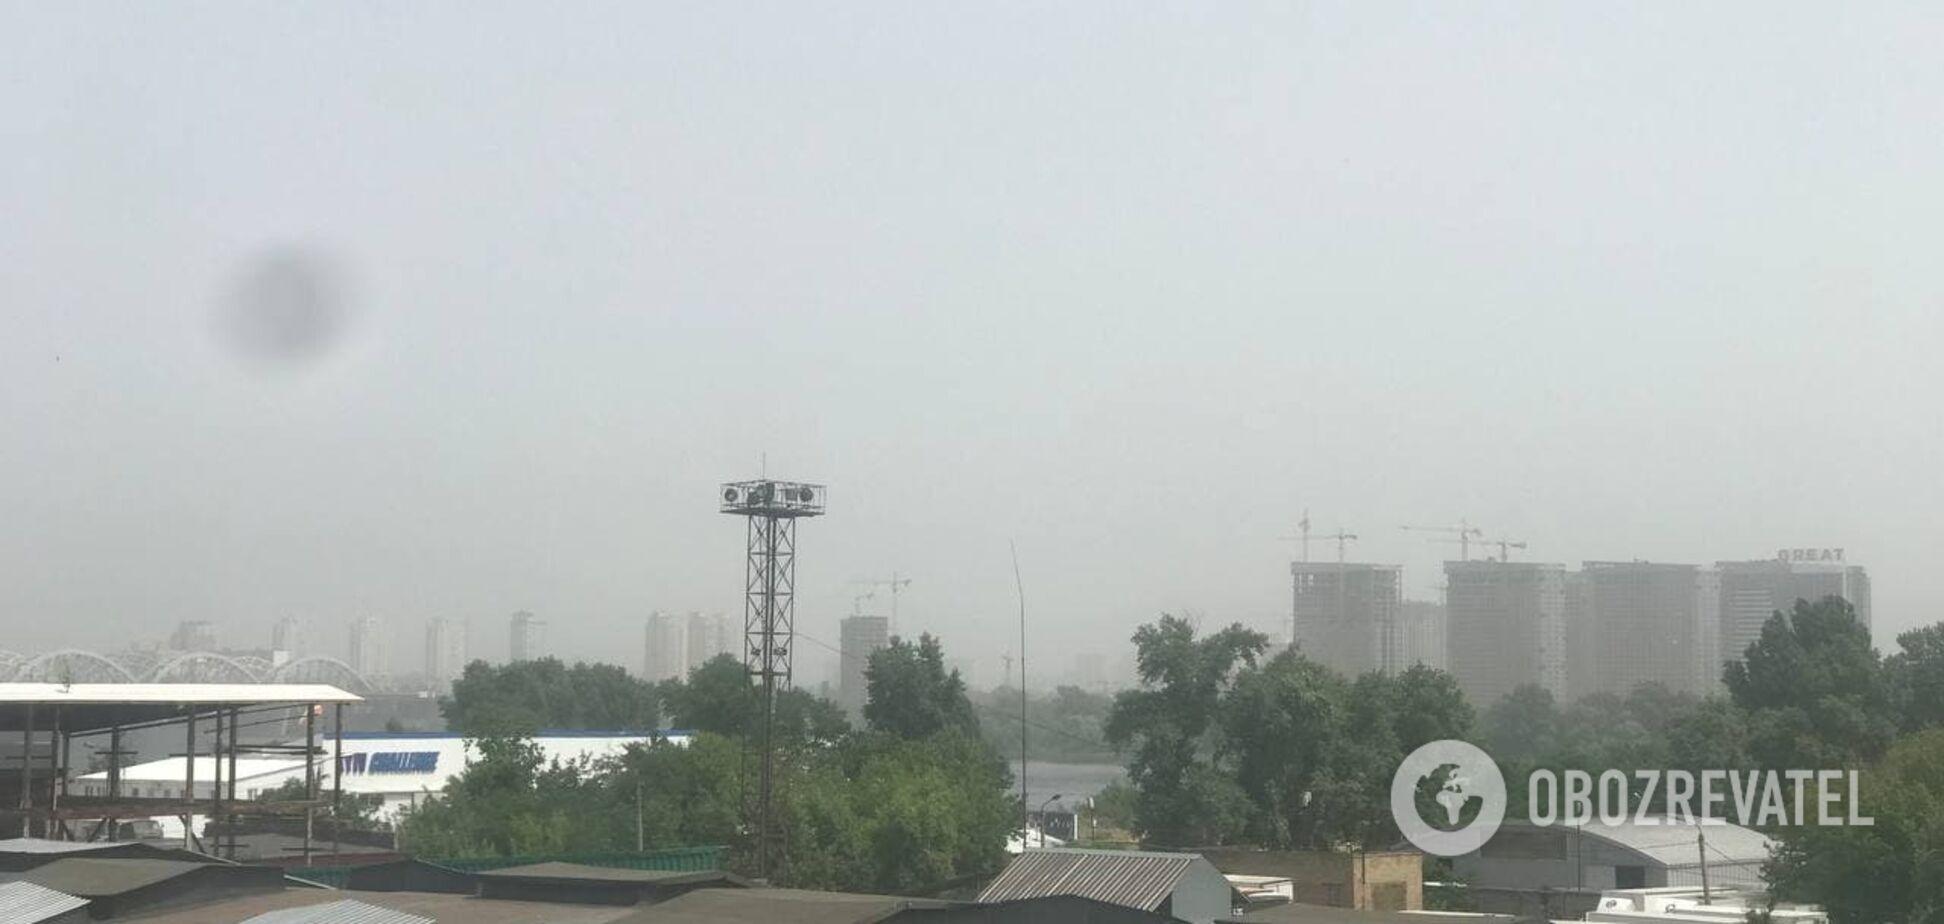 Київ через сильну спеку накрив смог. Фото